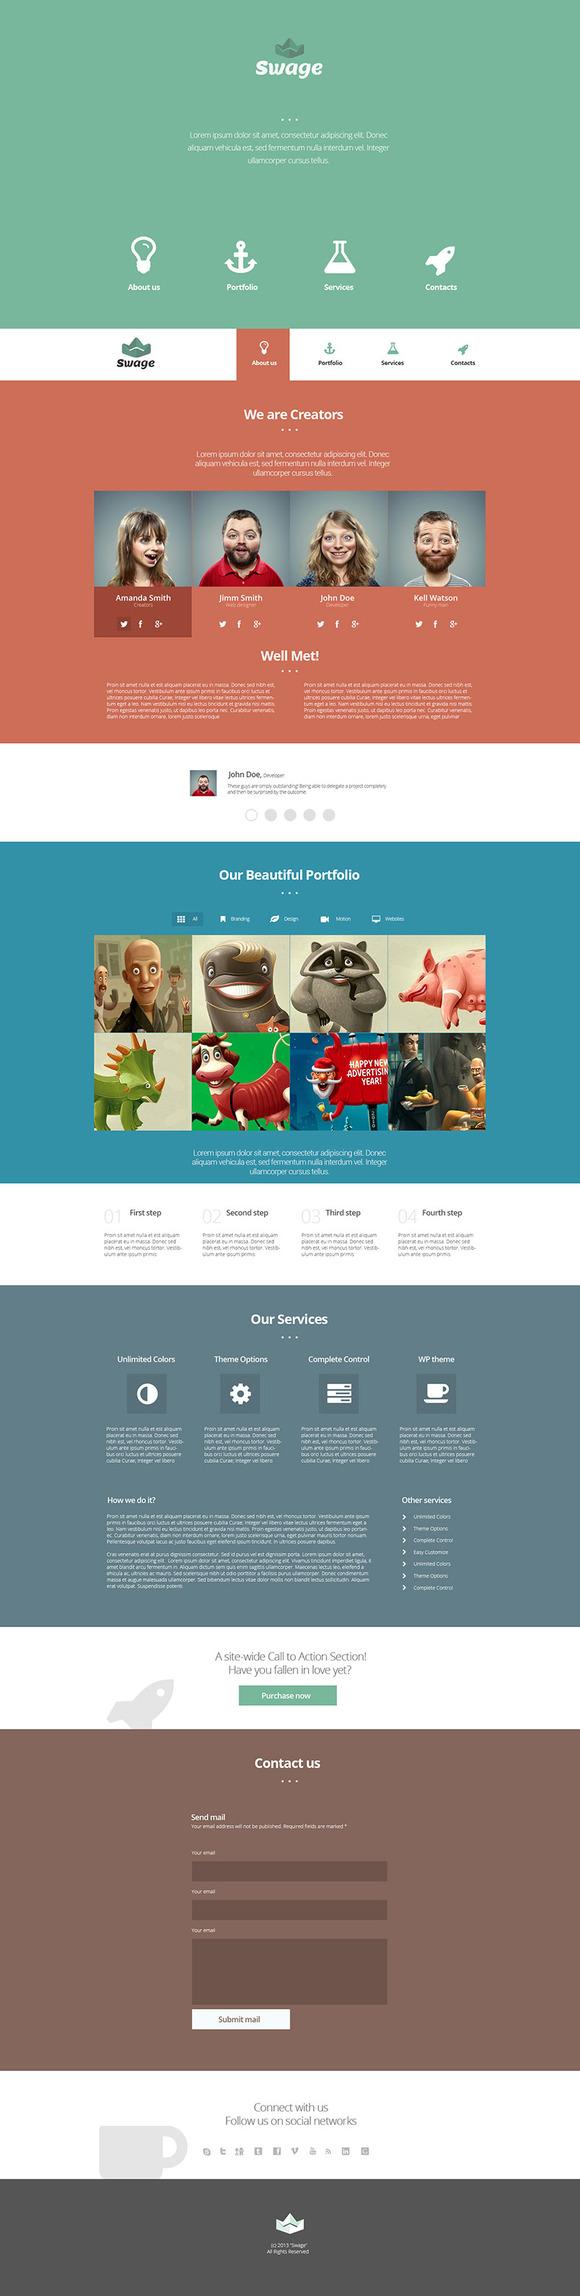 Swage Portfolio HTML5 CSS3